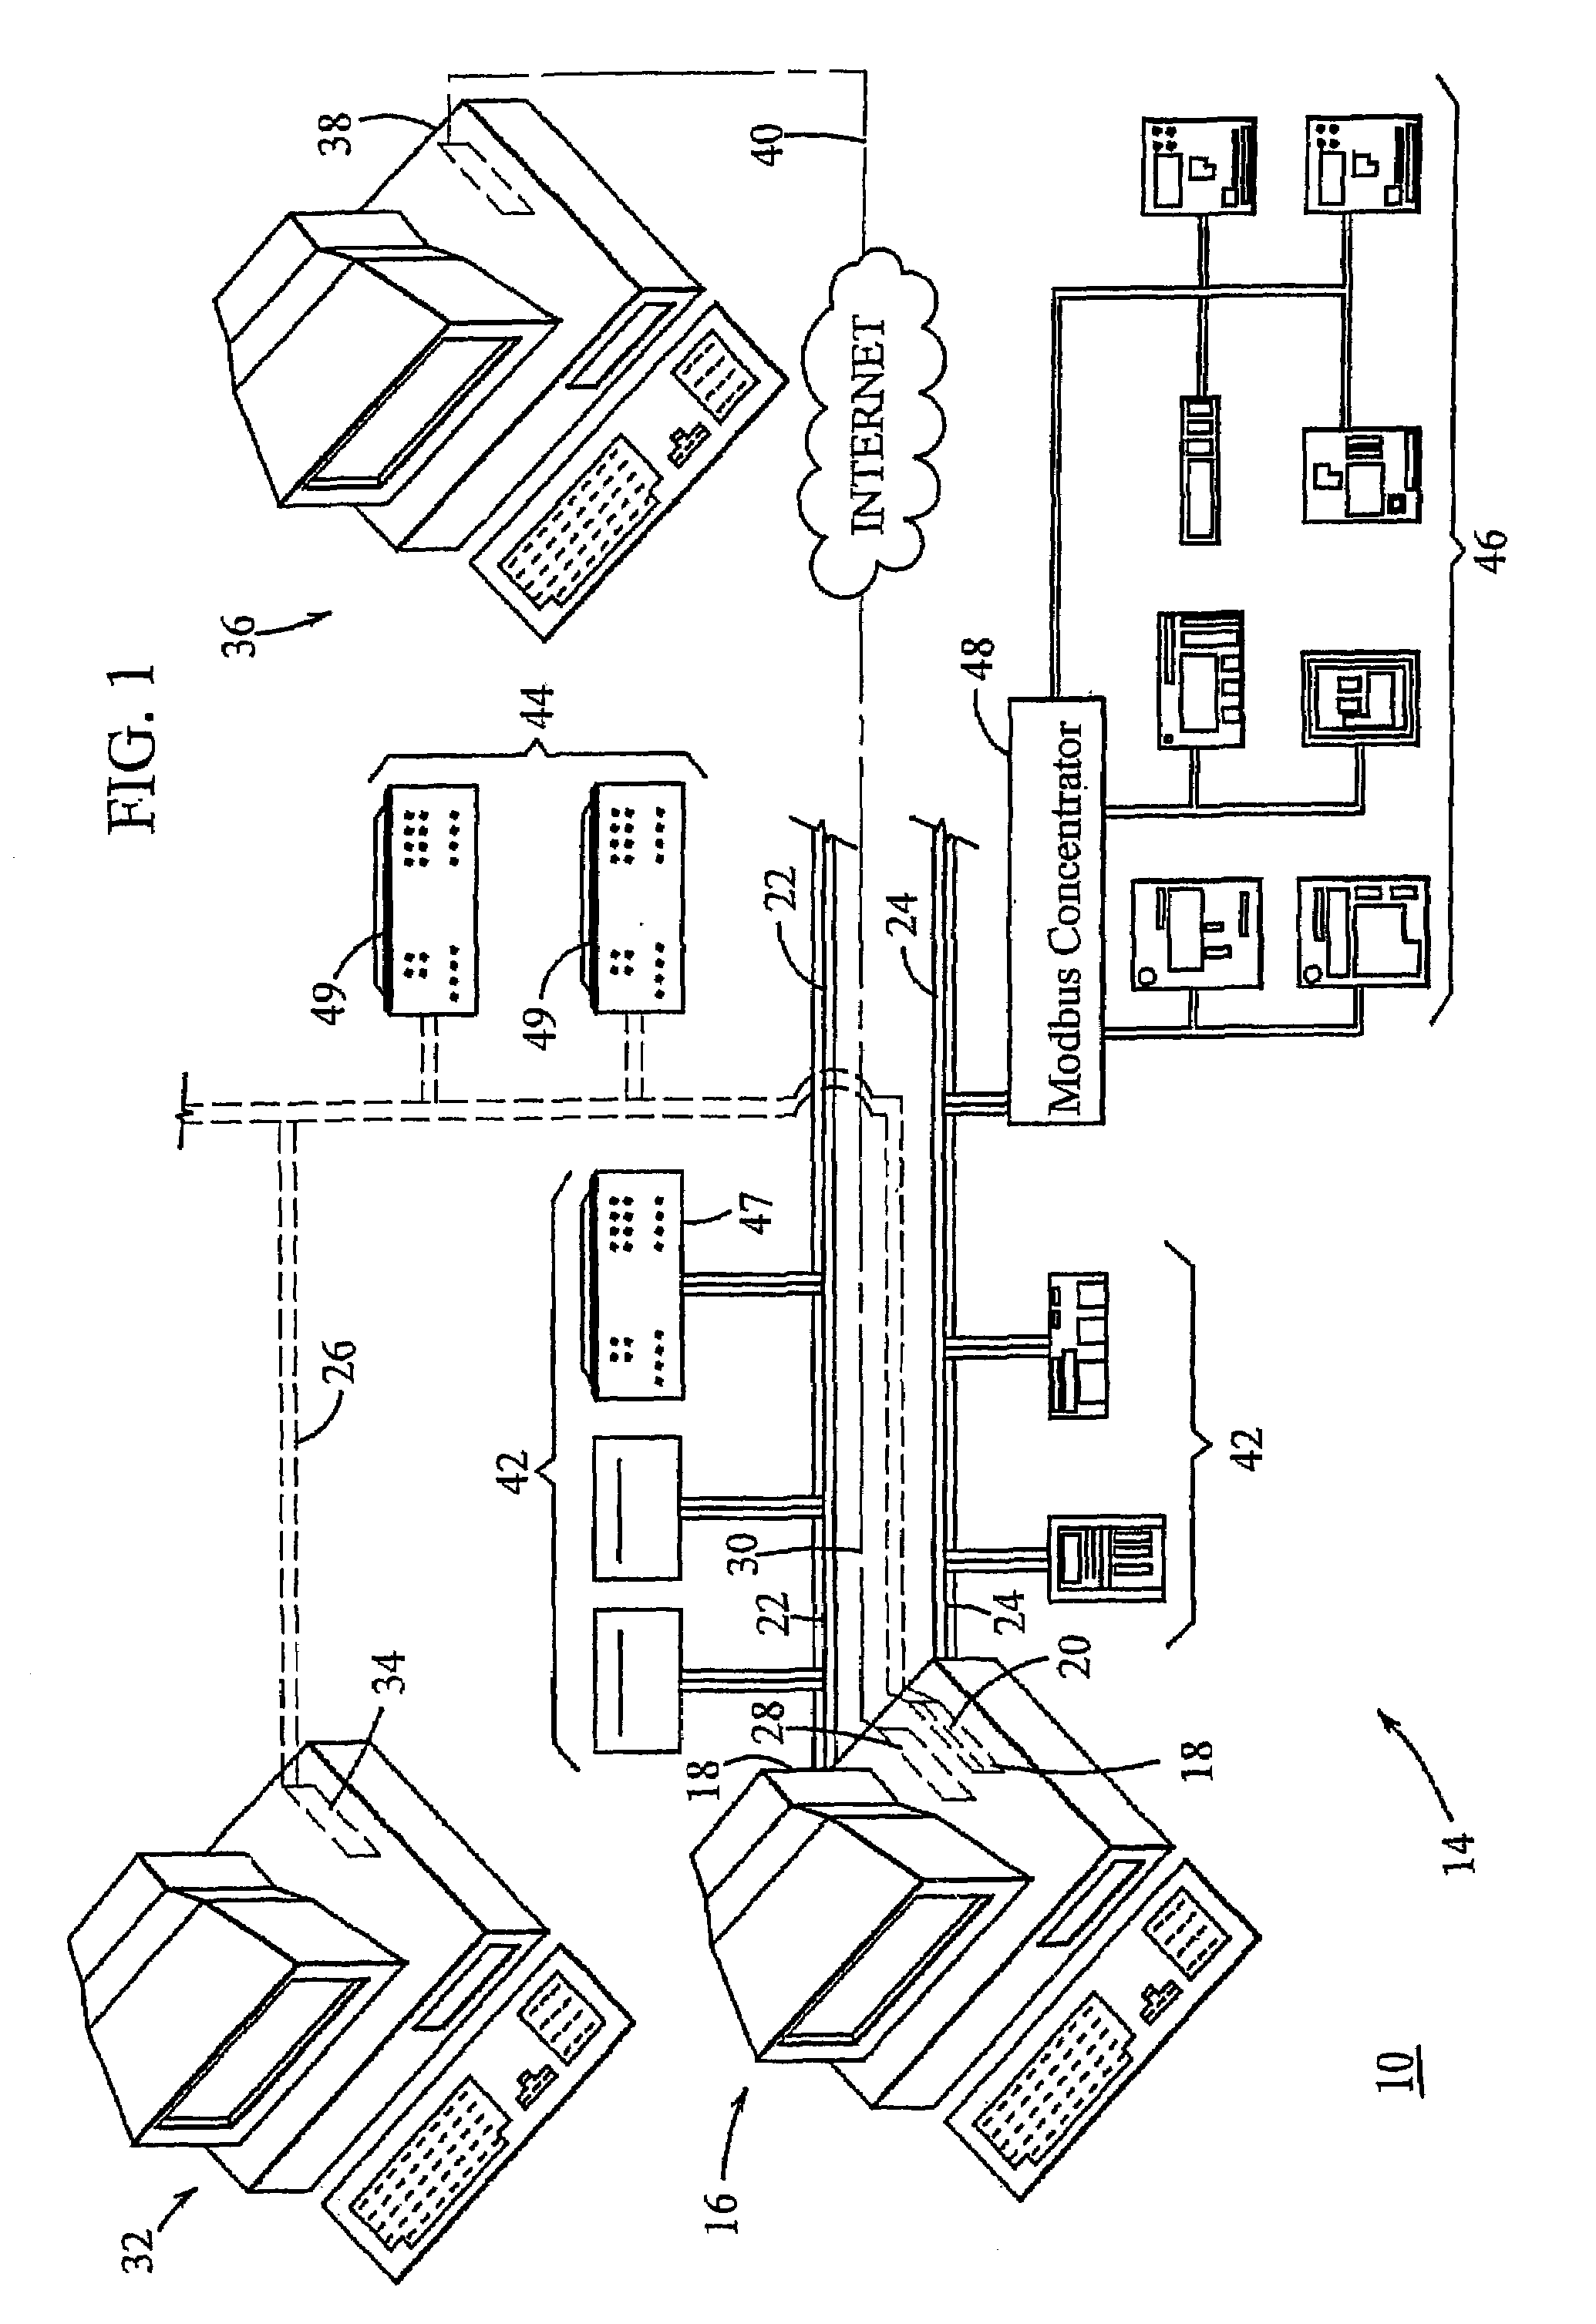 patent us7047274 - virtual modular relay device